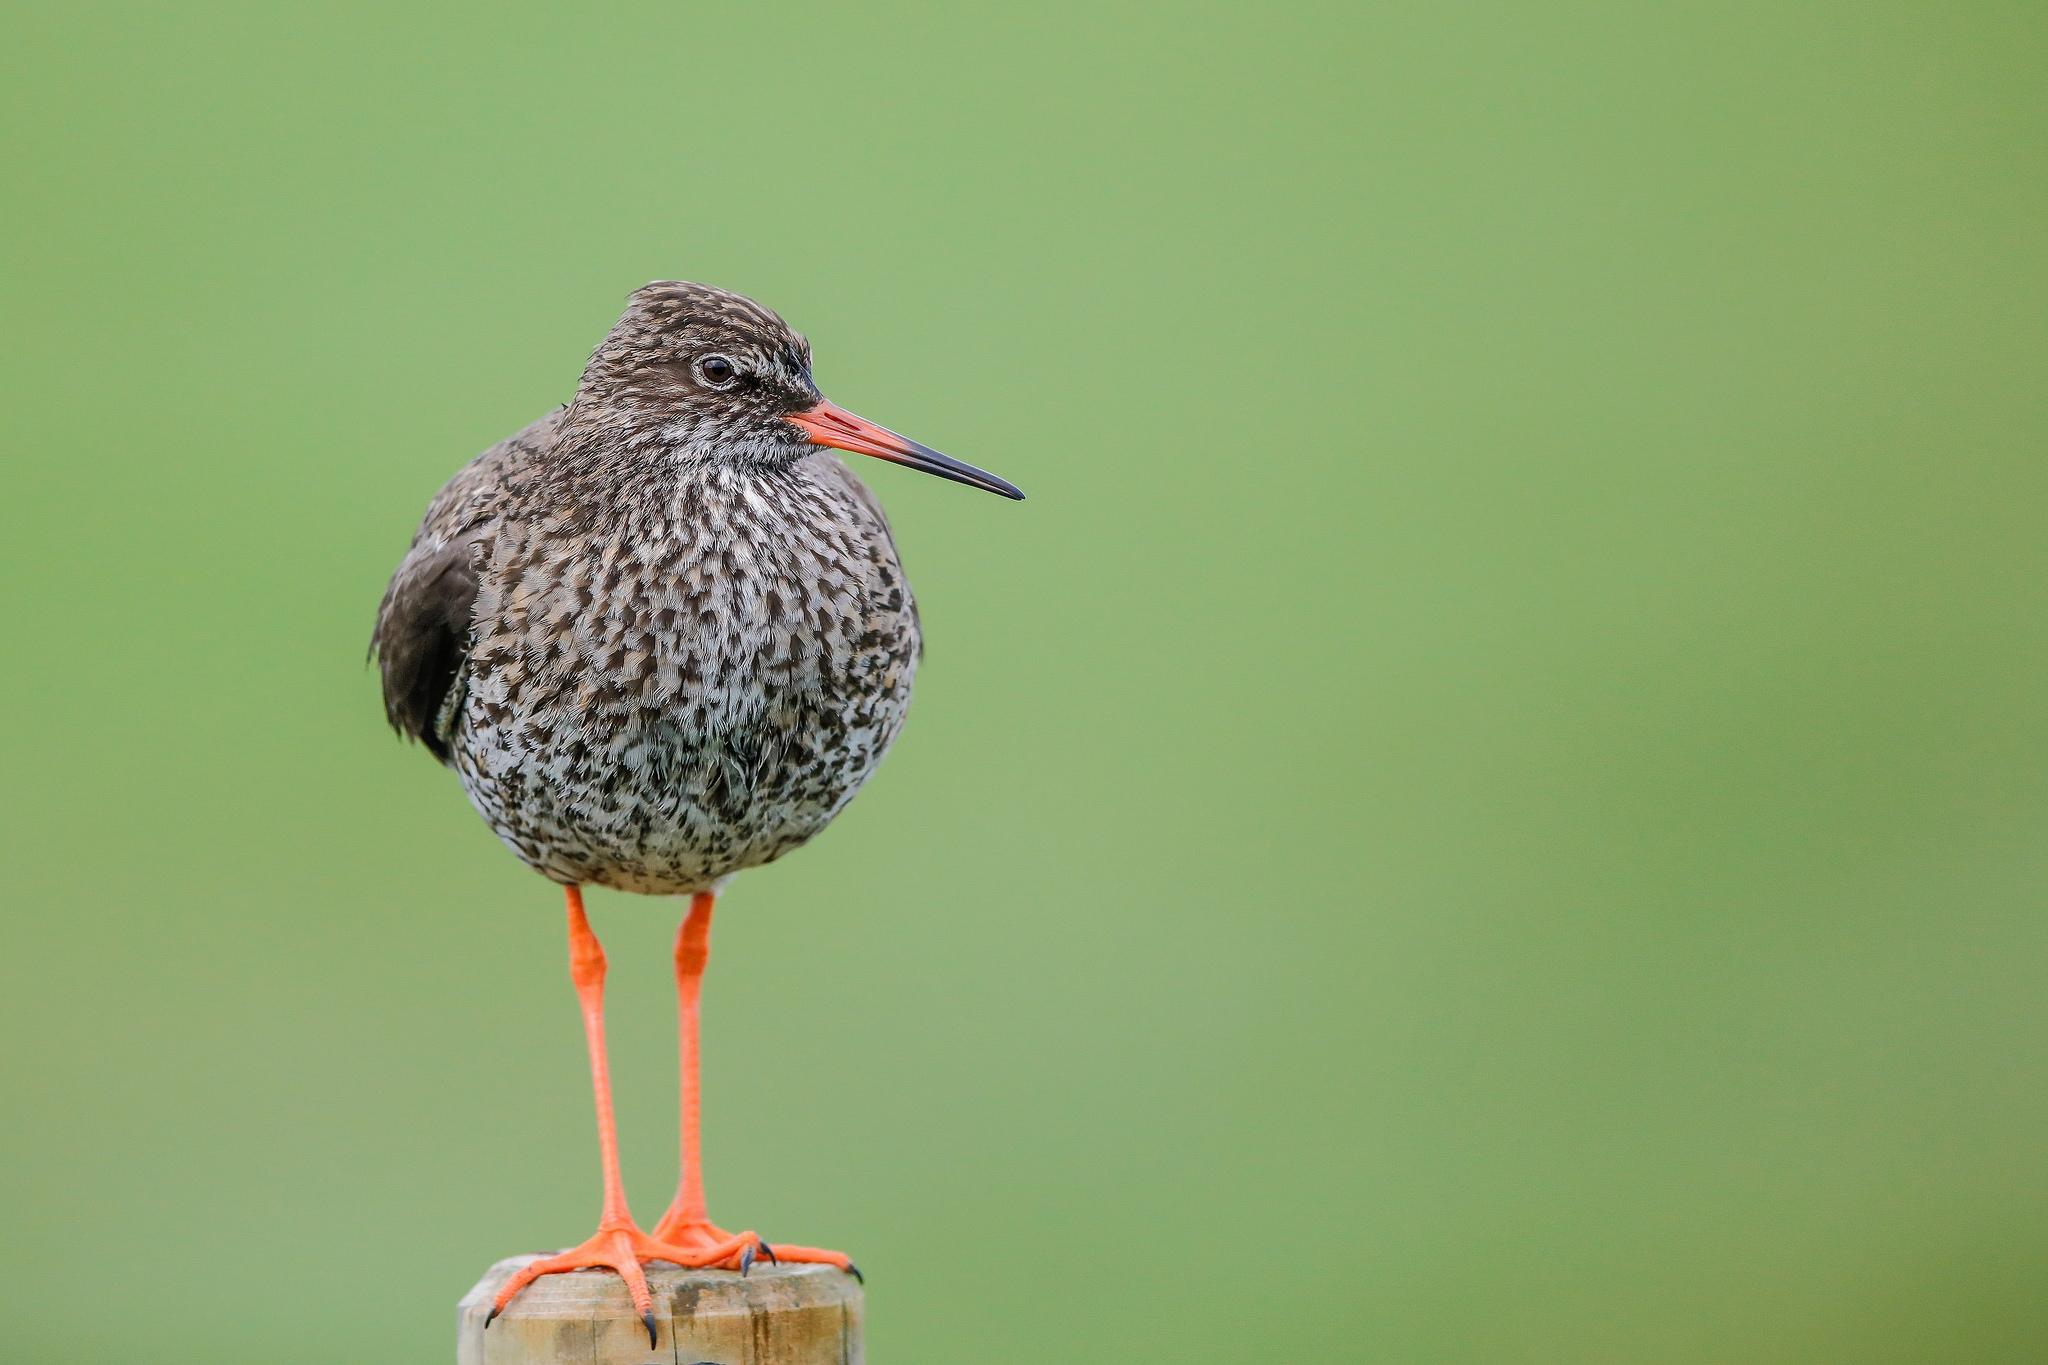 Aves hermosas - 2048x1365